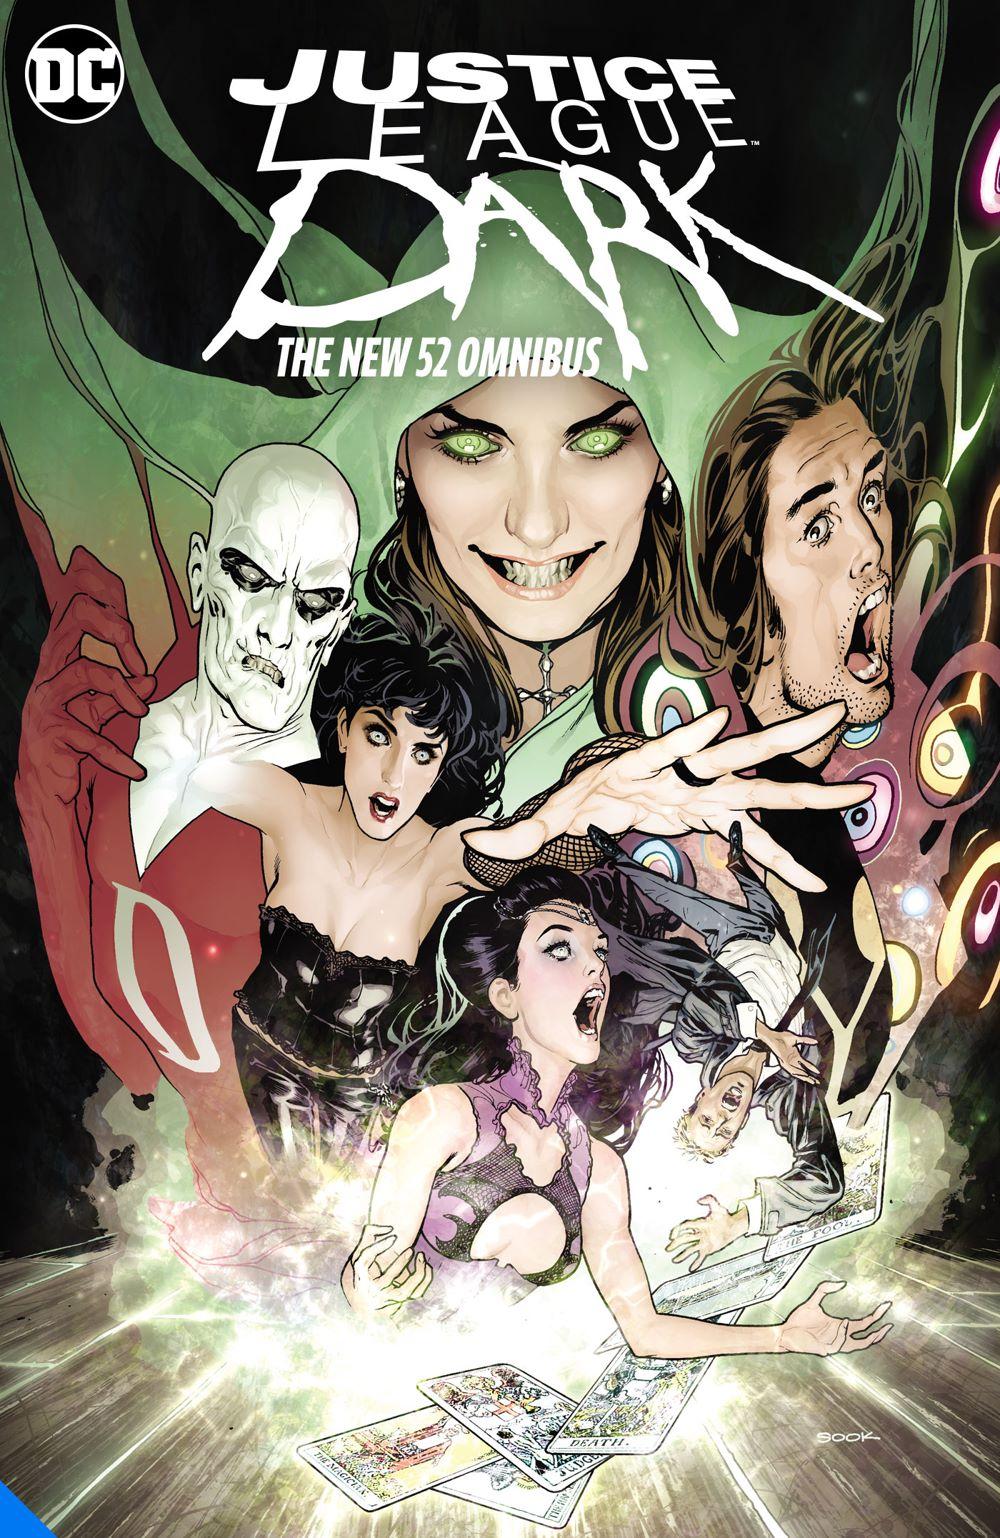 justiceleaguedarkthenew52omni_adv DC Comics July 2021 Solicitations